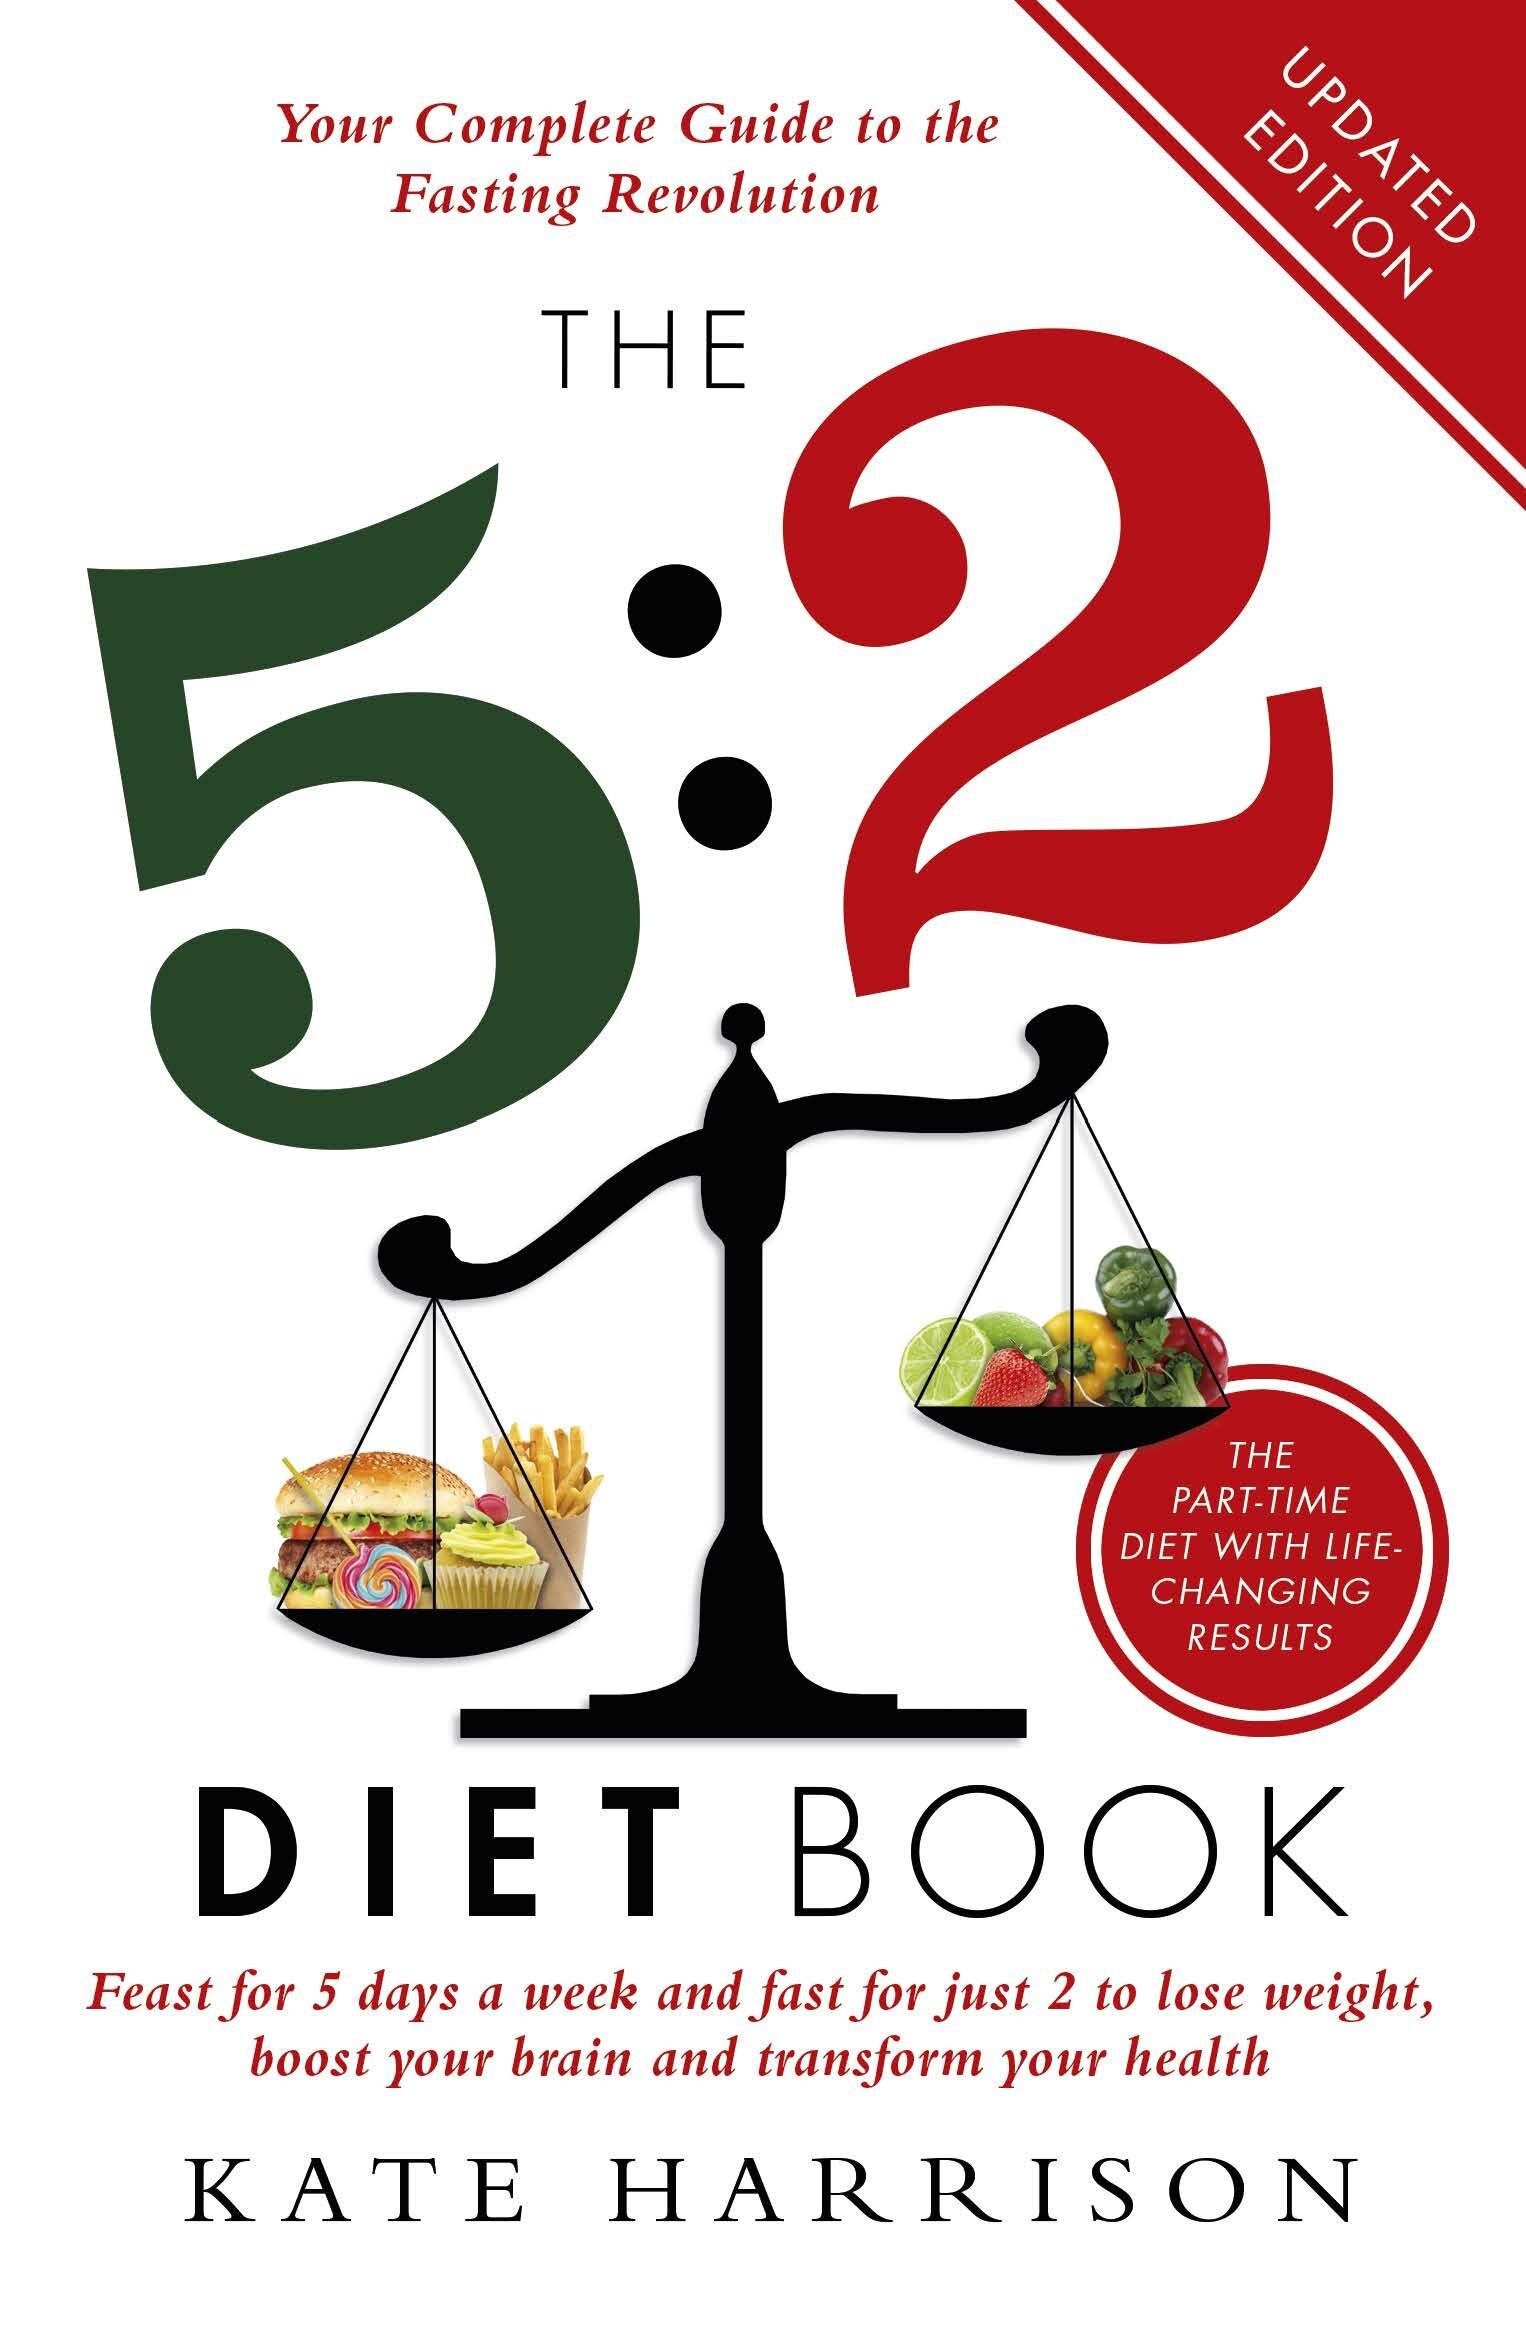 The-5-2-Diet-Book-PFP-REV1.jpg (Copy) (Copy) (Copy)